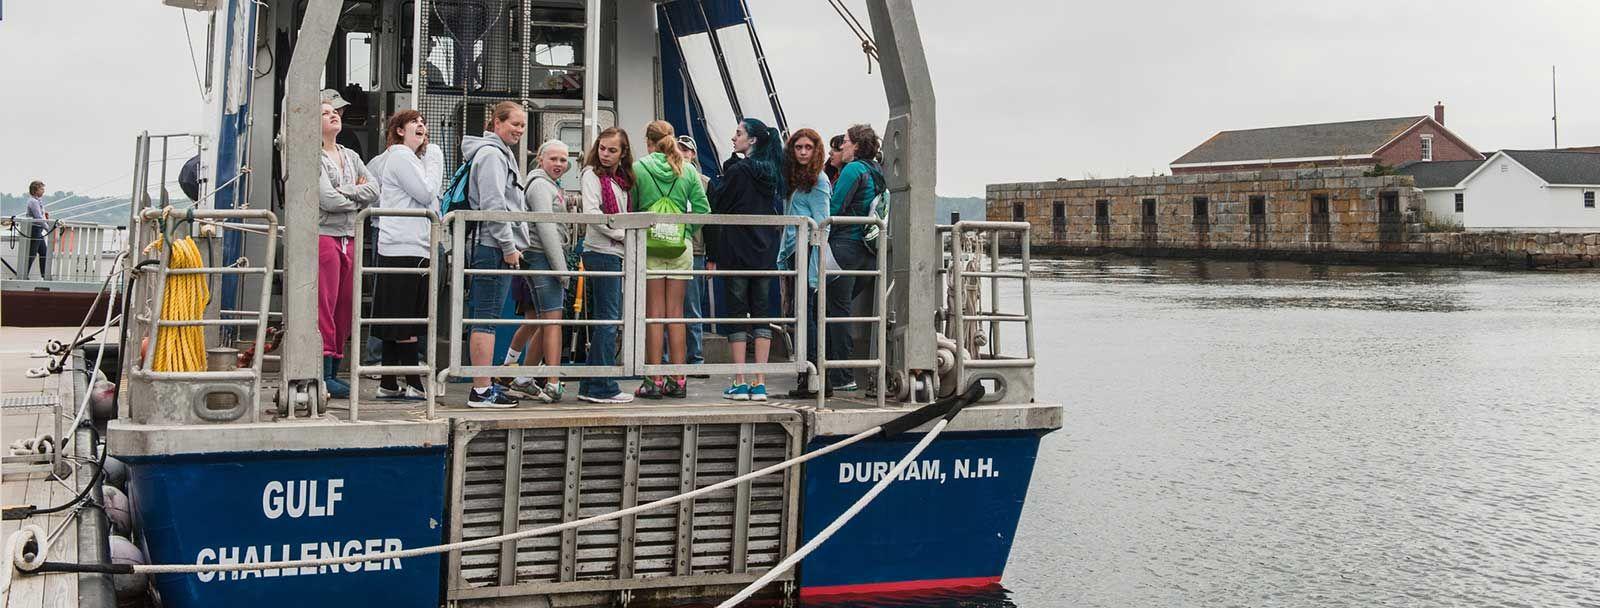 UNH Ocean Discovery Day October 4, 2014